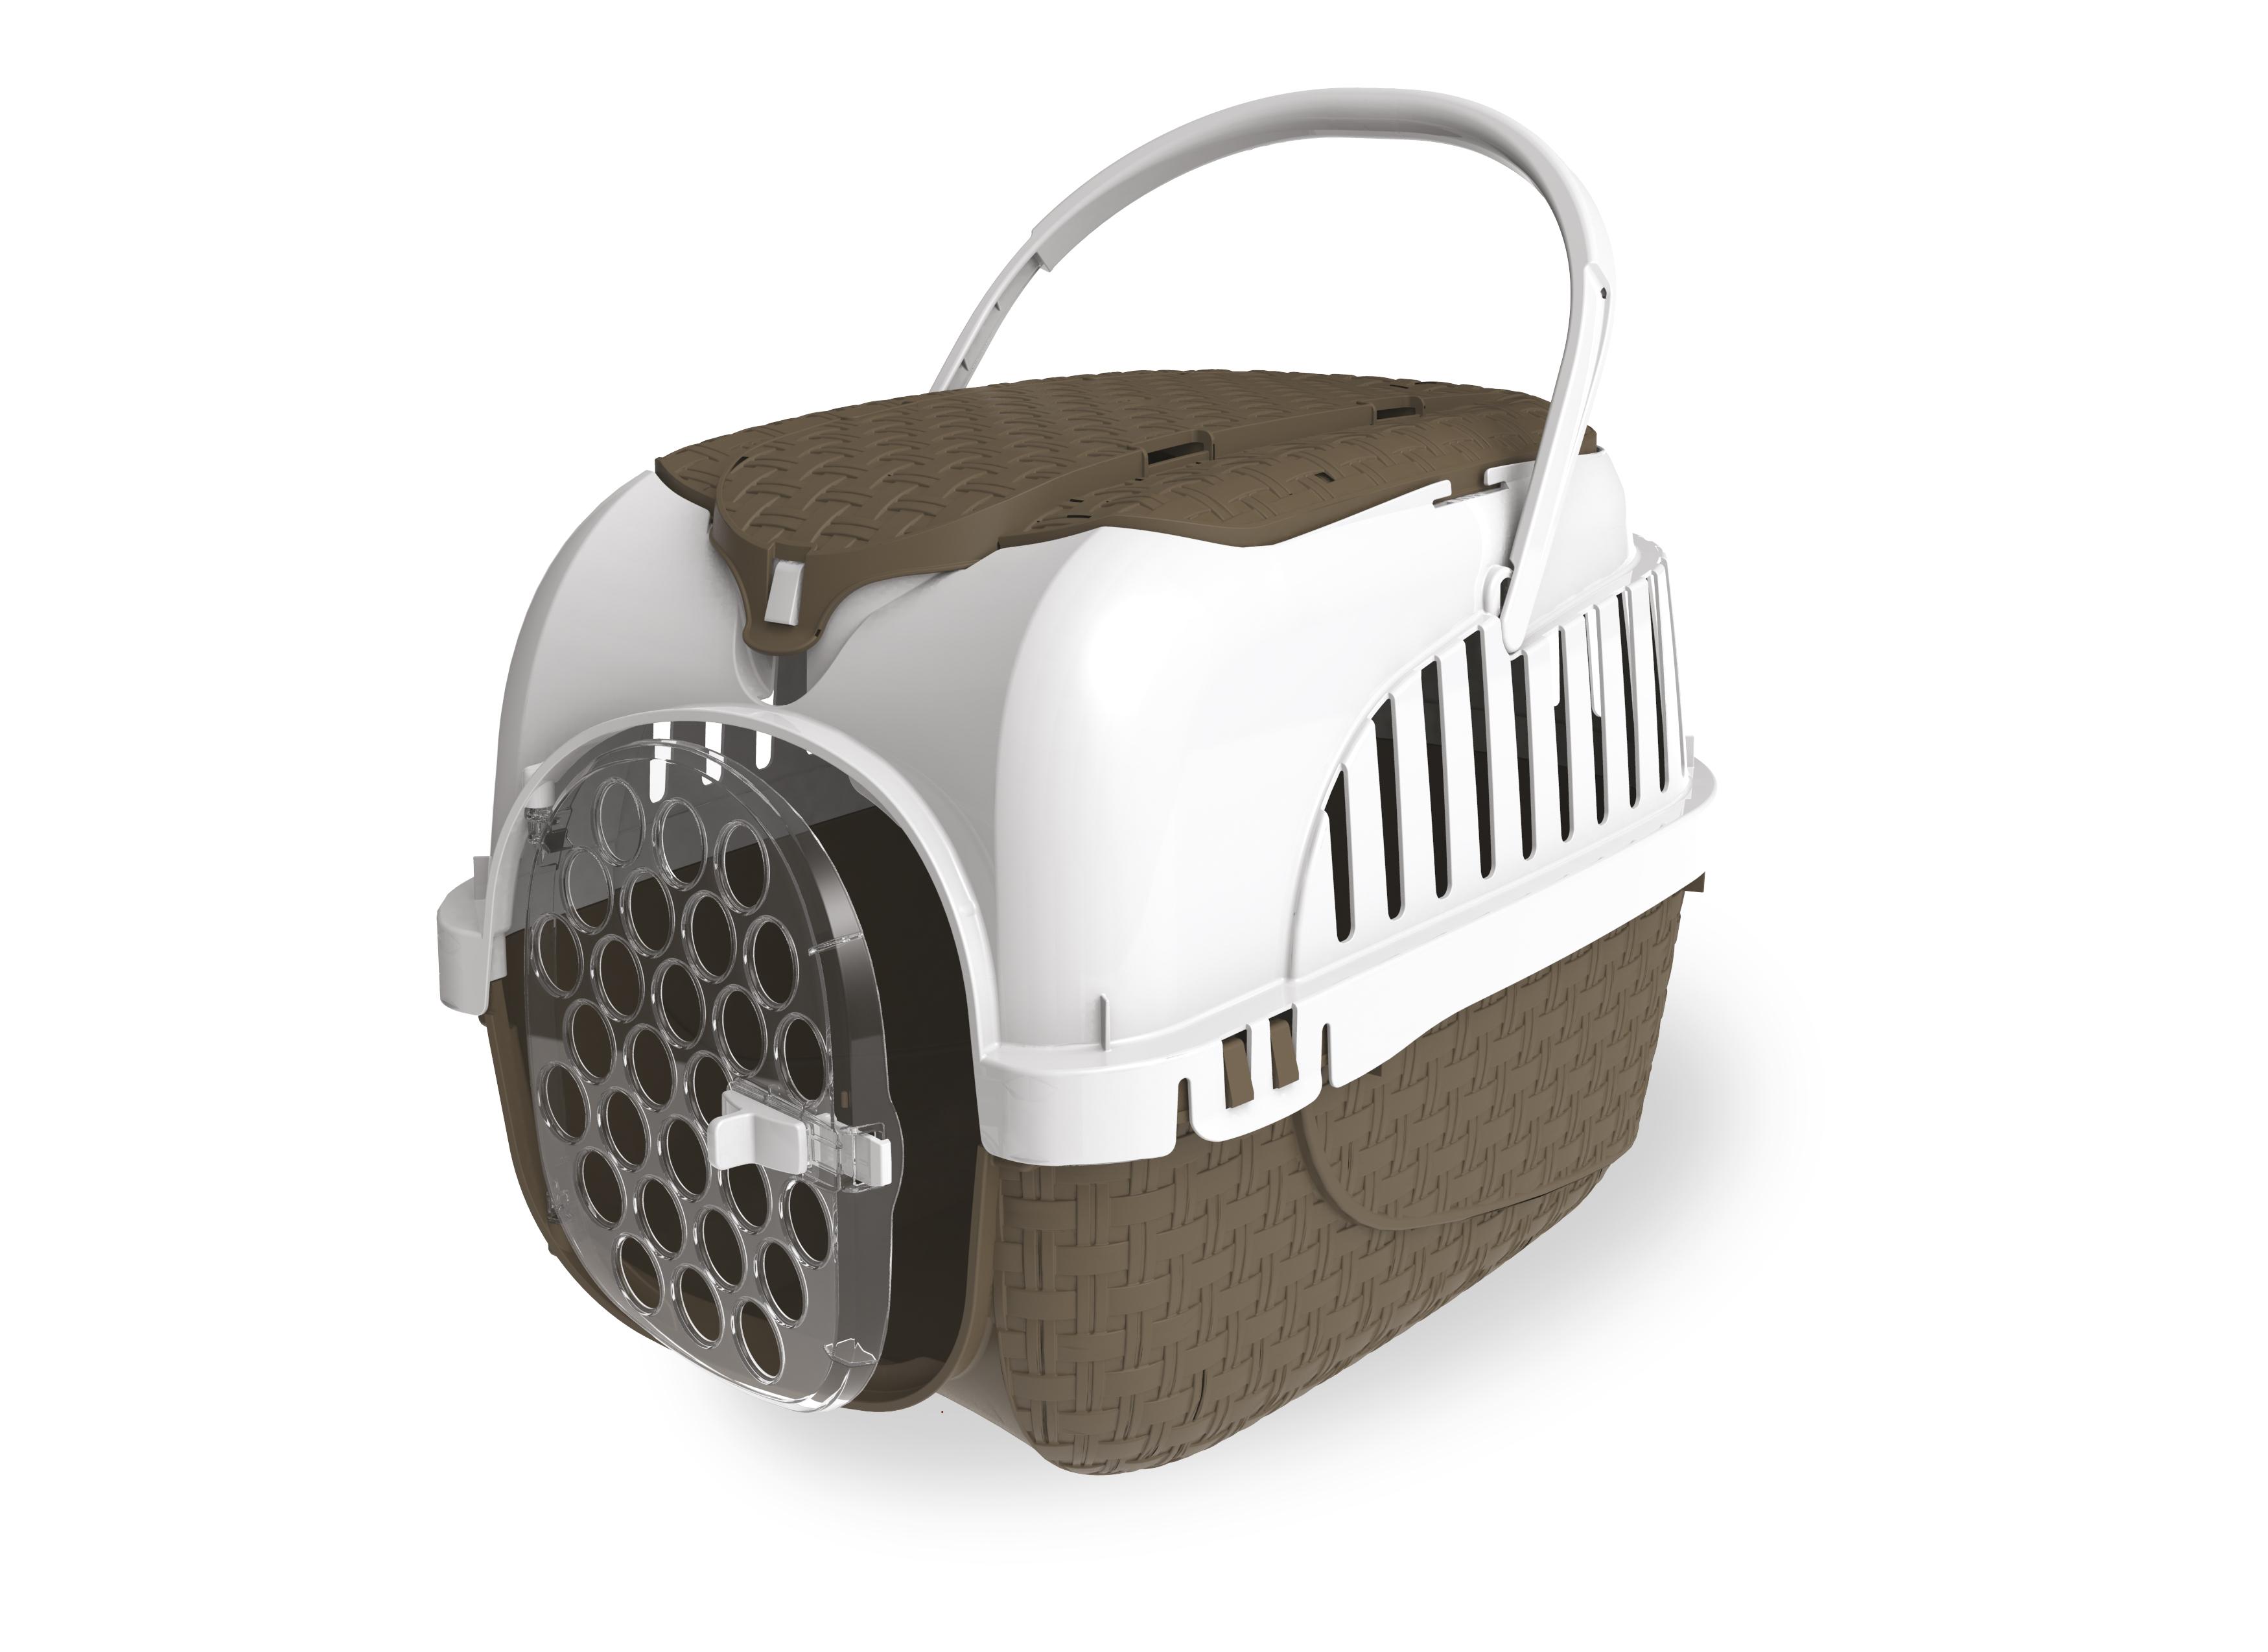 Контейнер для кошки, собаки Bama Pet Kennel